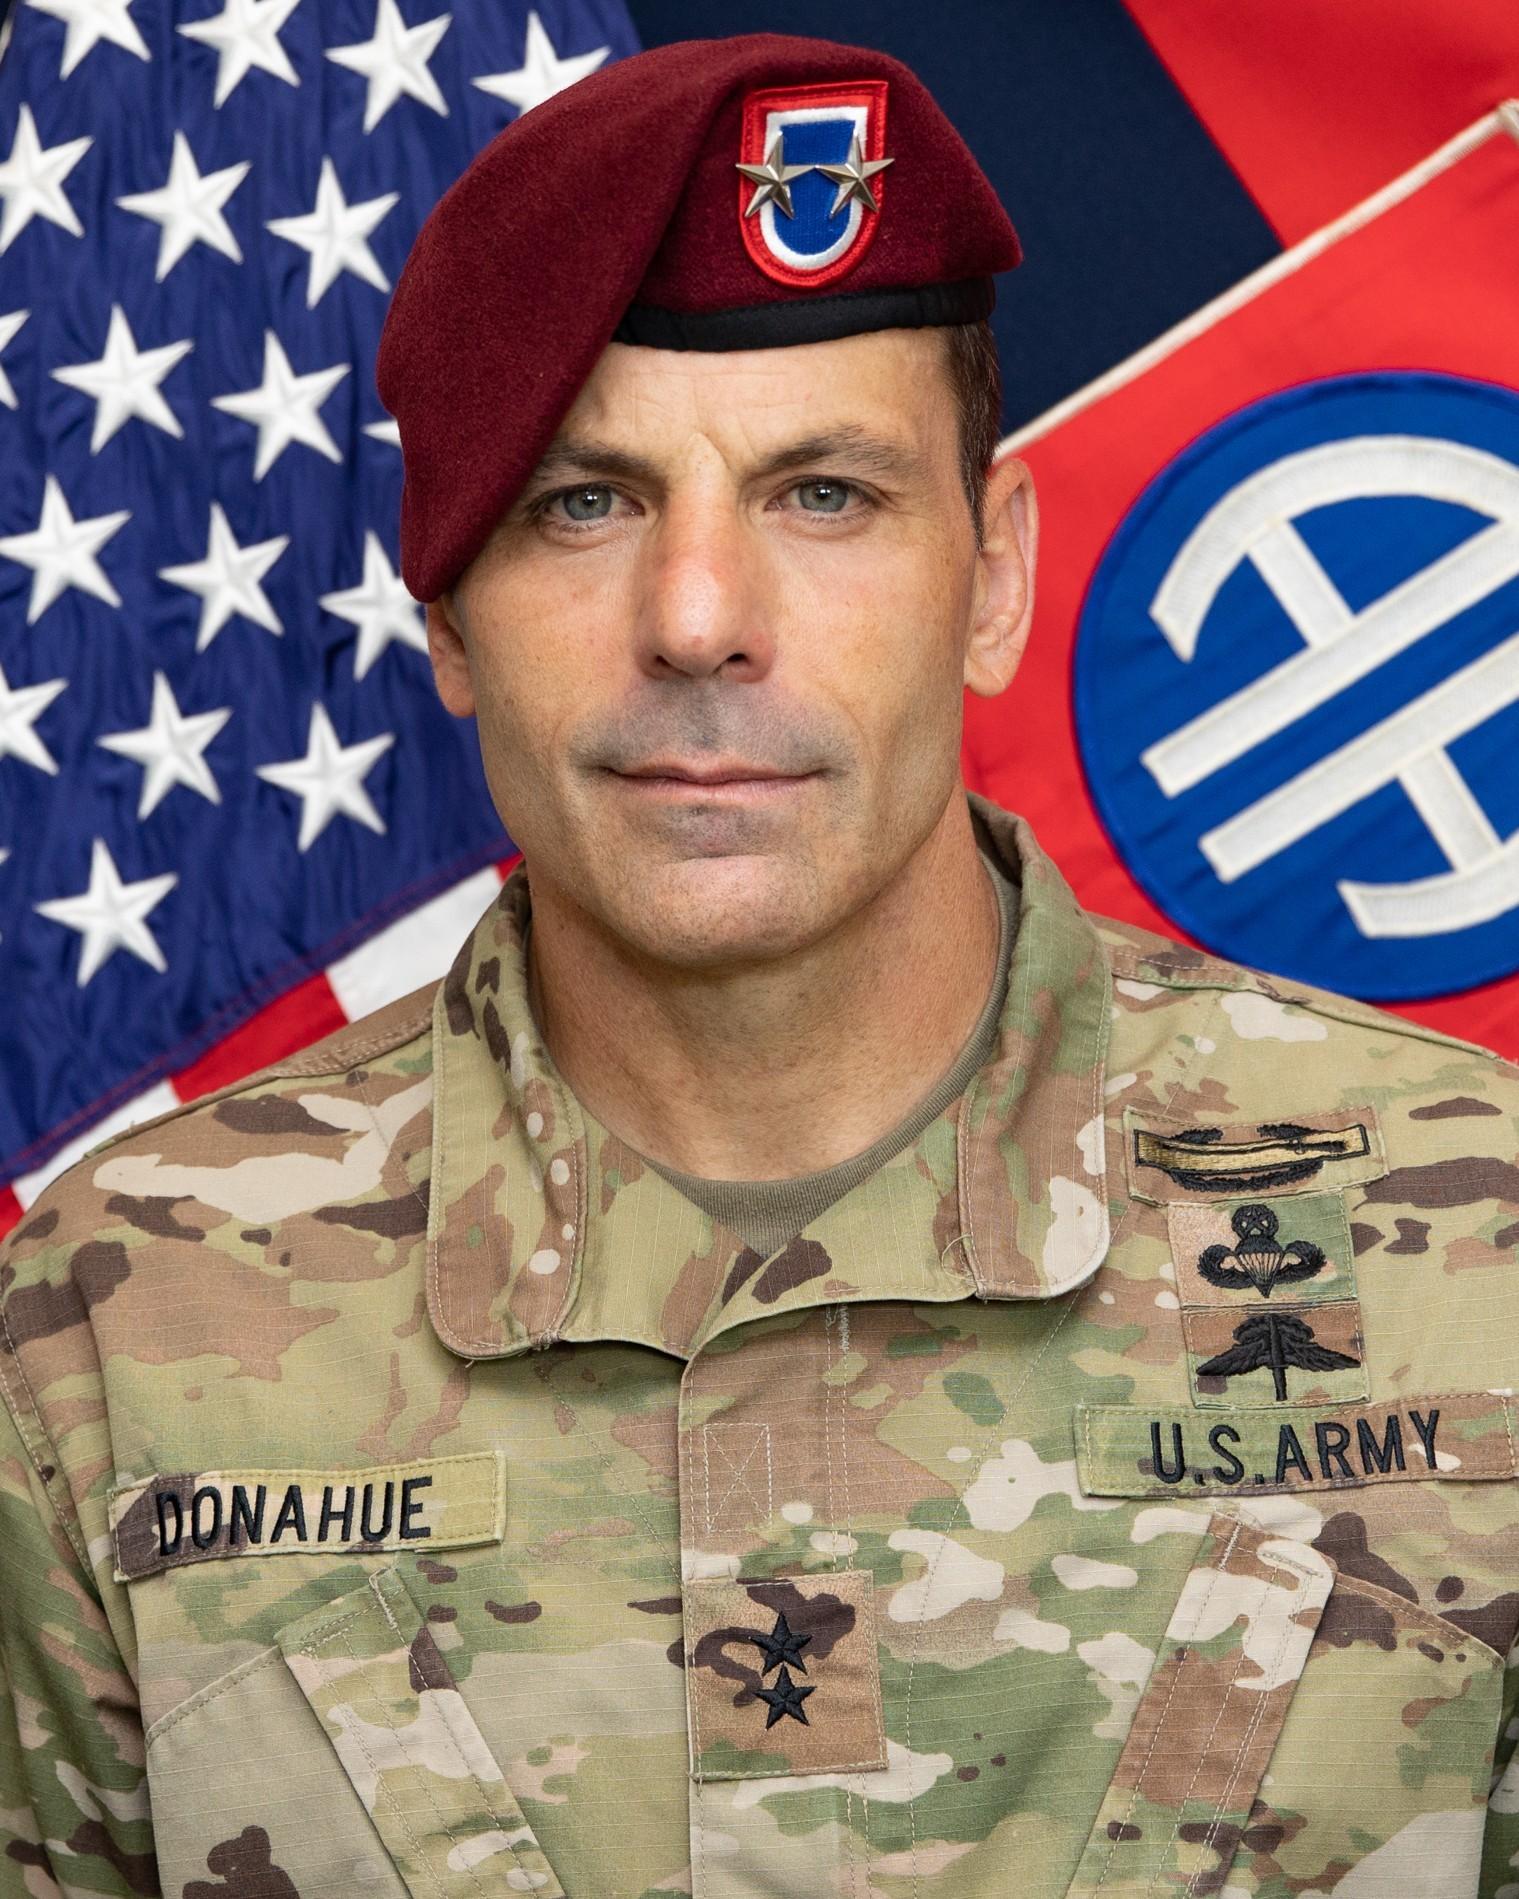 Maj. Gen. Christopher Donahue